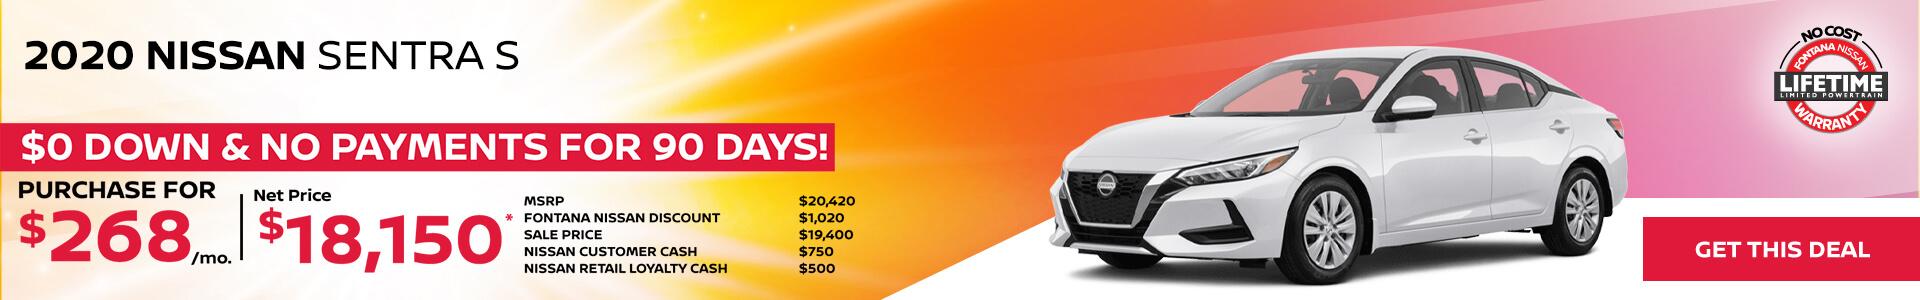 Nissan Sentra $268